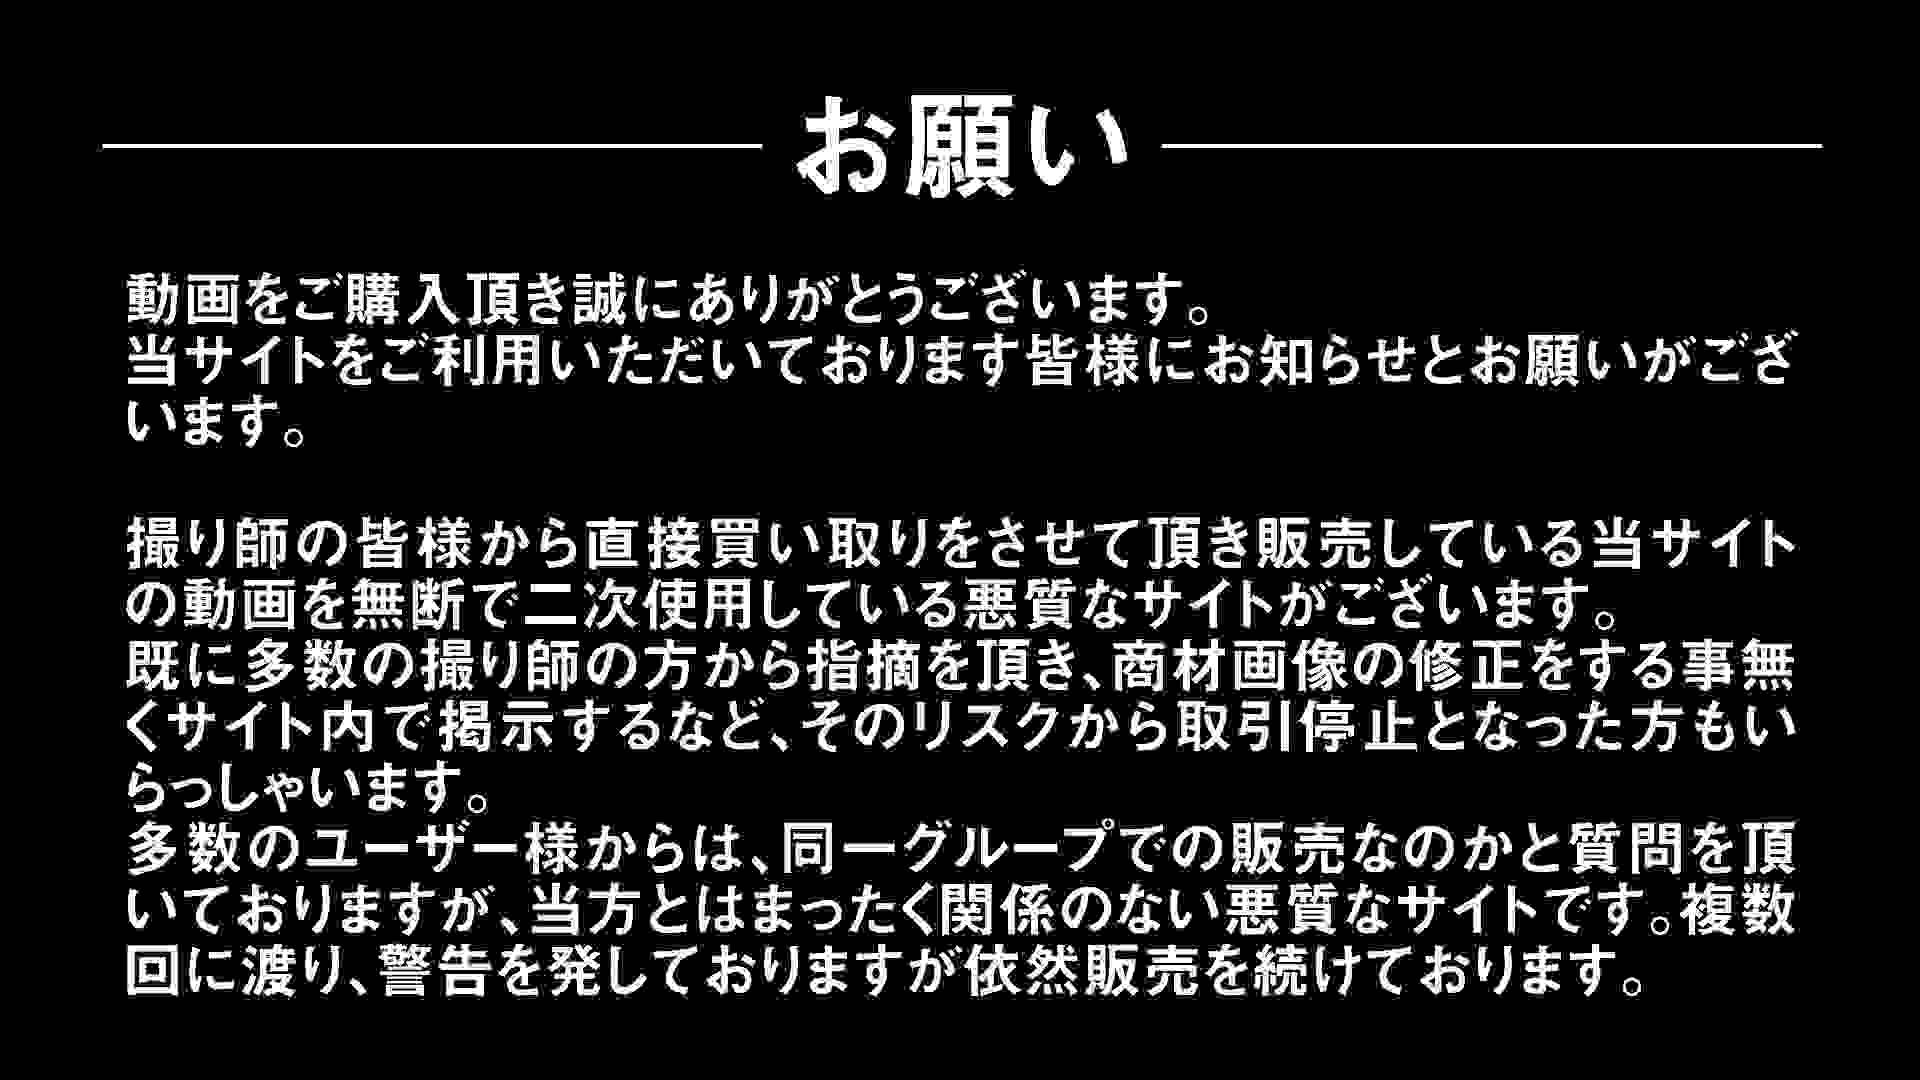 Aquaな露天風呂Vol.302 OLセックス 盗み撮りオマンコ動画キャプチャ 73画像 2